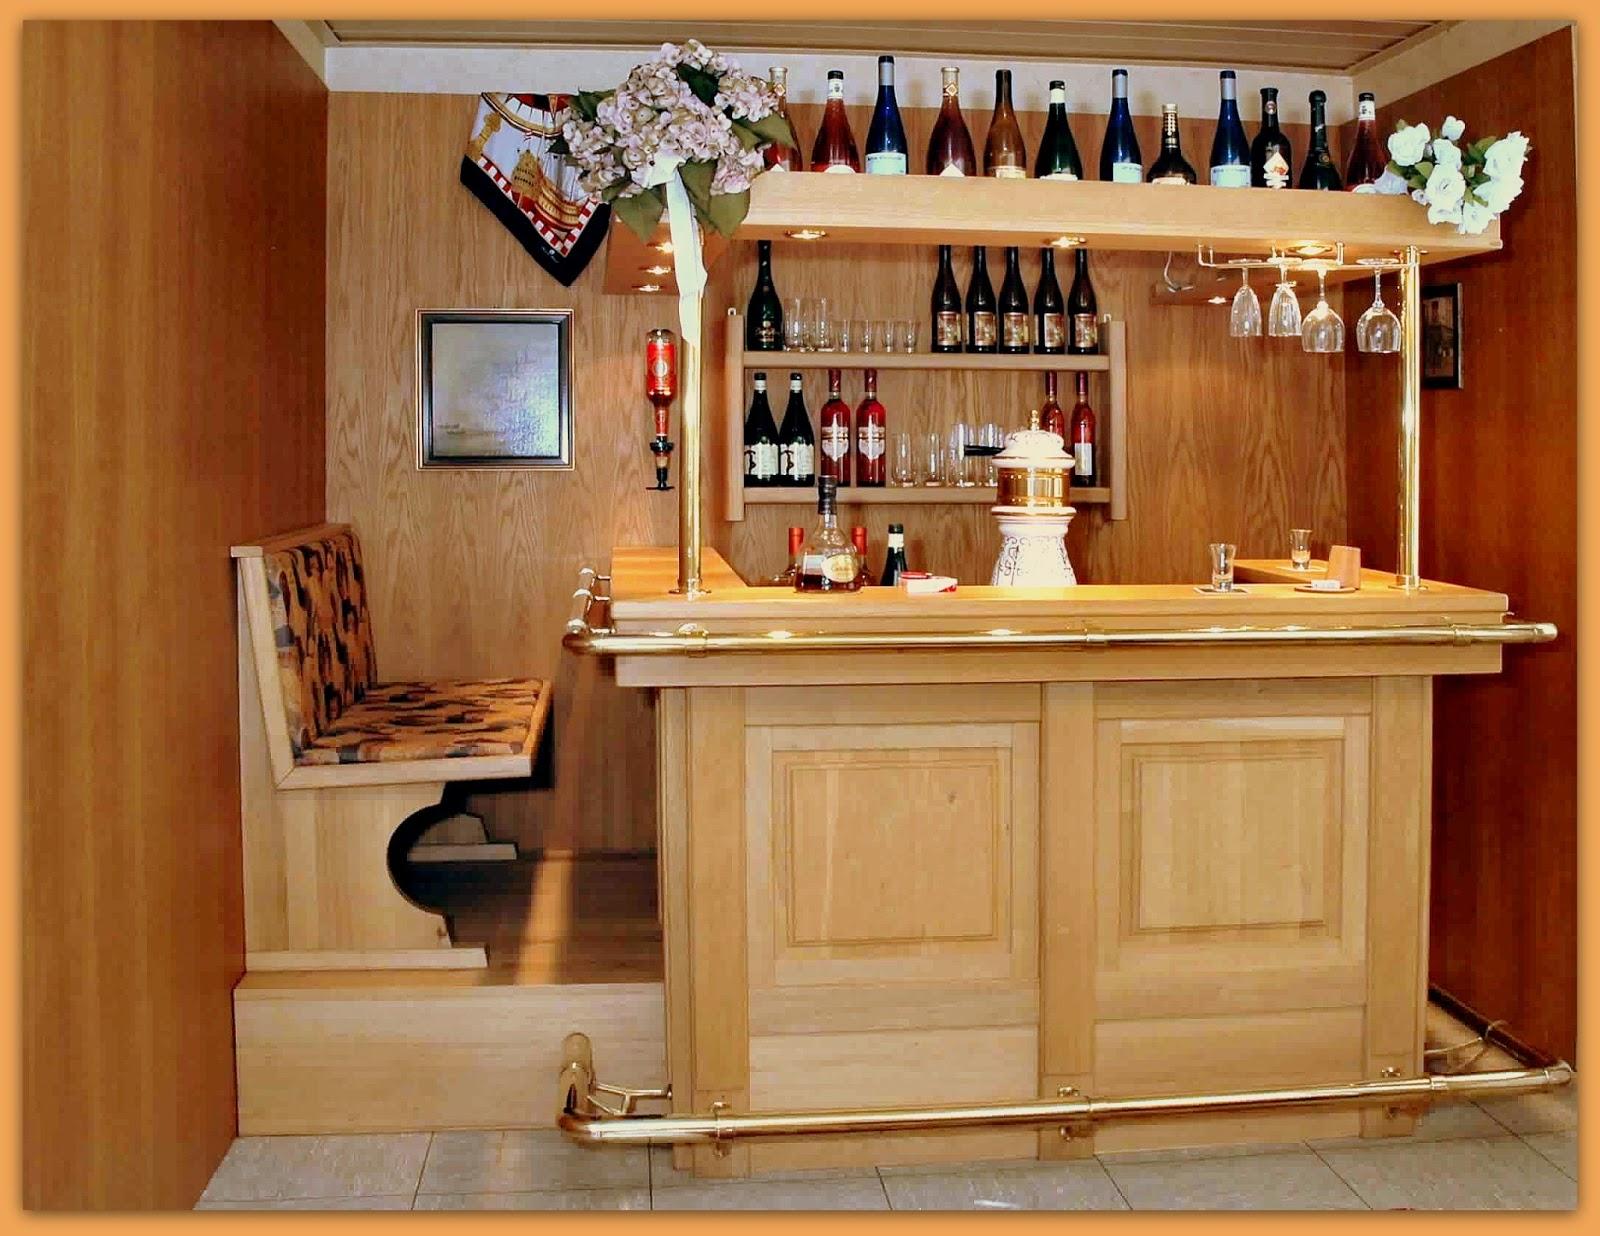 Dise o y decoraci n de la casa bar moderno de dise o for Diseno de cantinas para el hogar